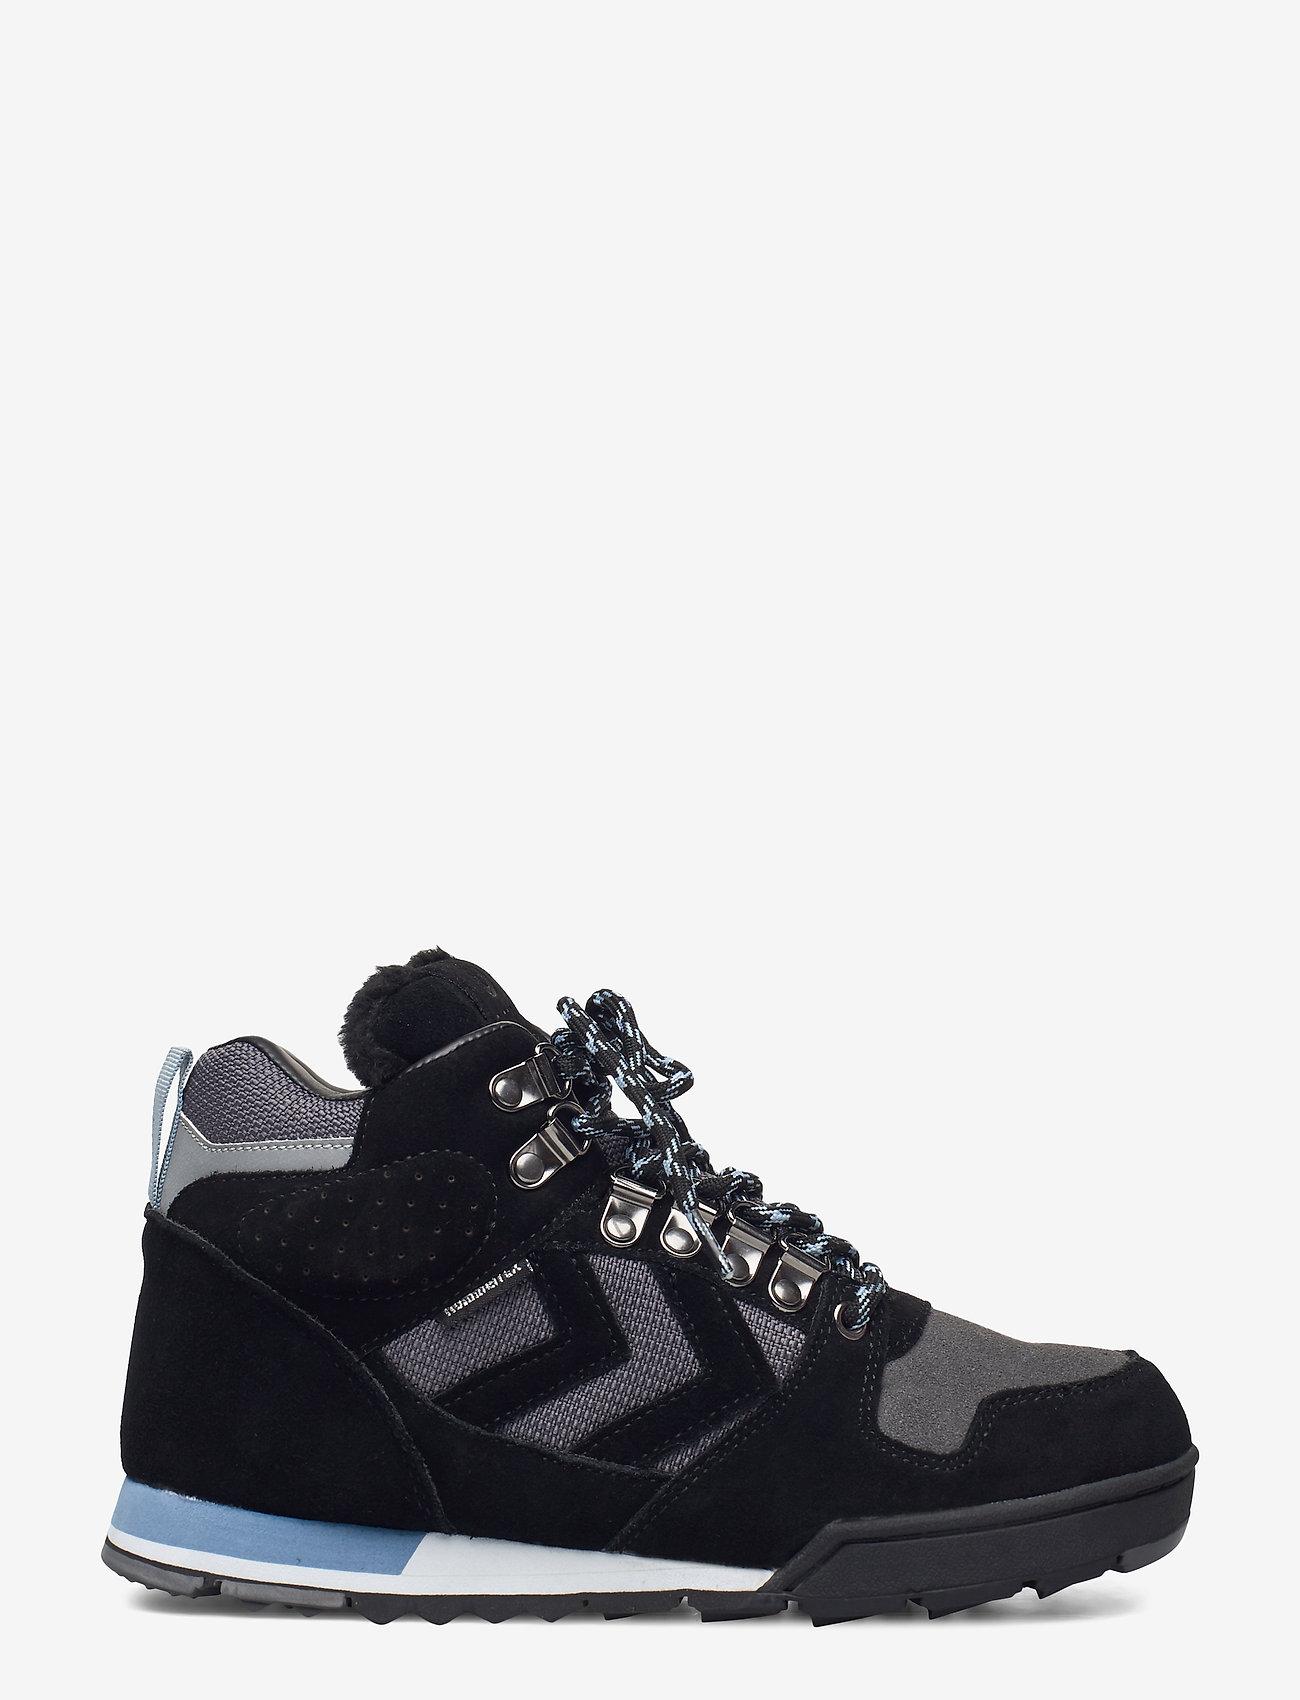 Hummel - NORDIC ROOTS FOREST MID - hoog sneakers - black - 0